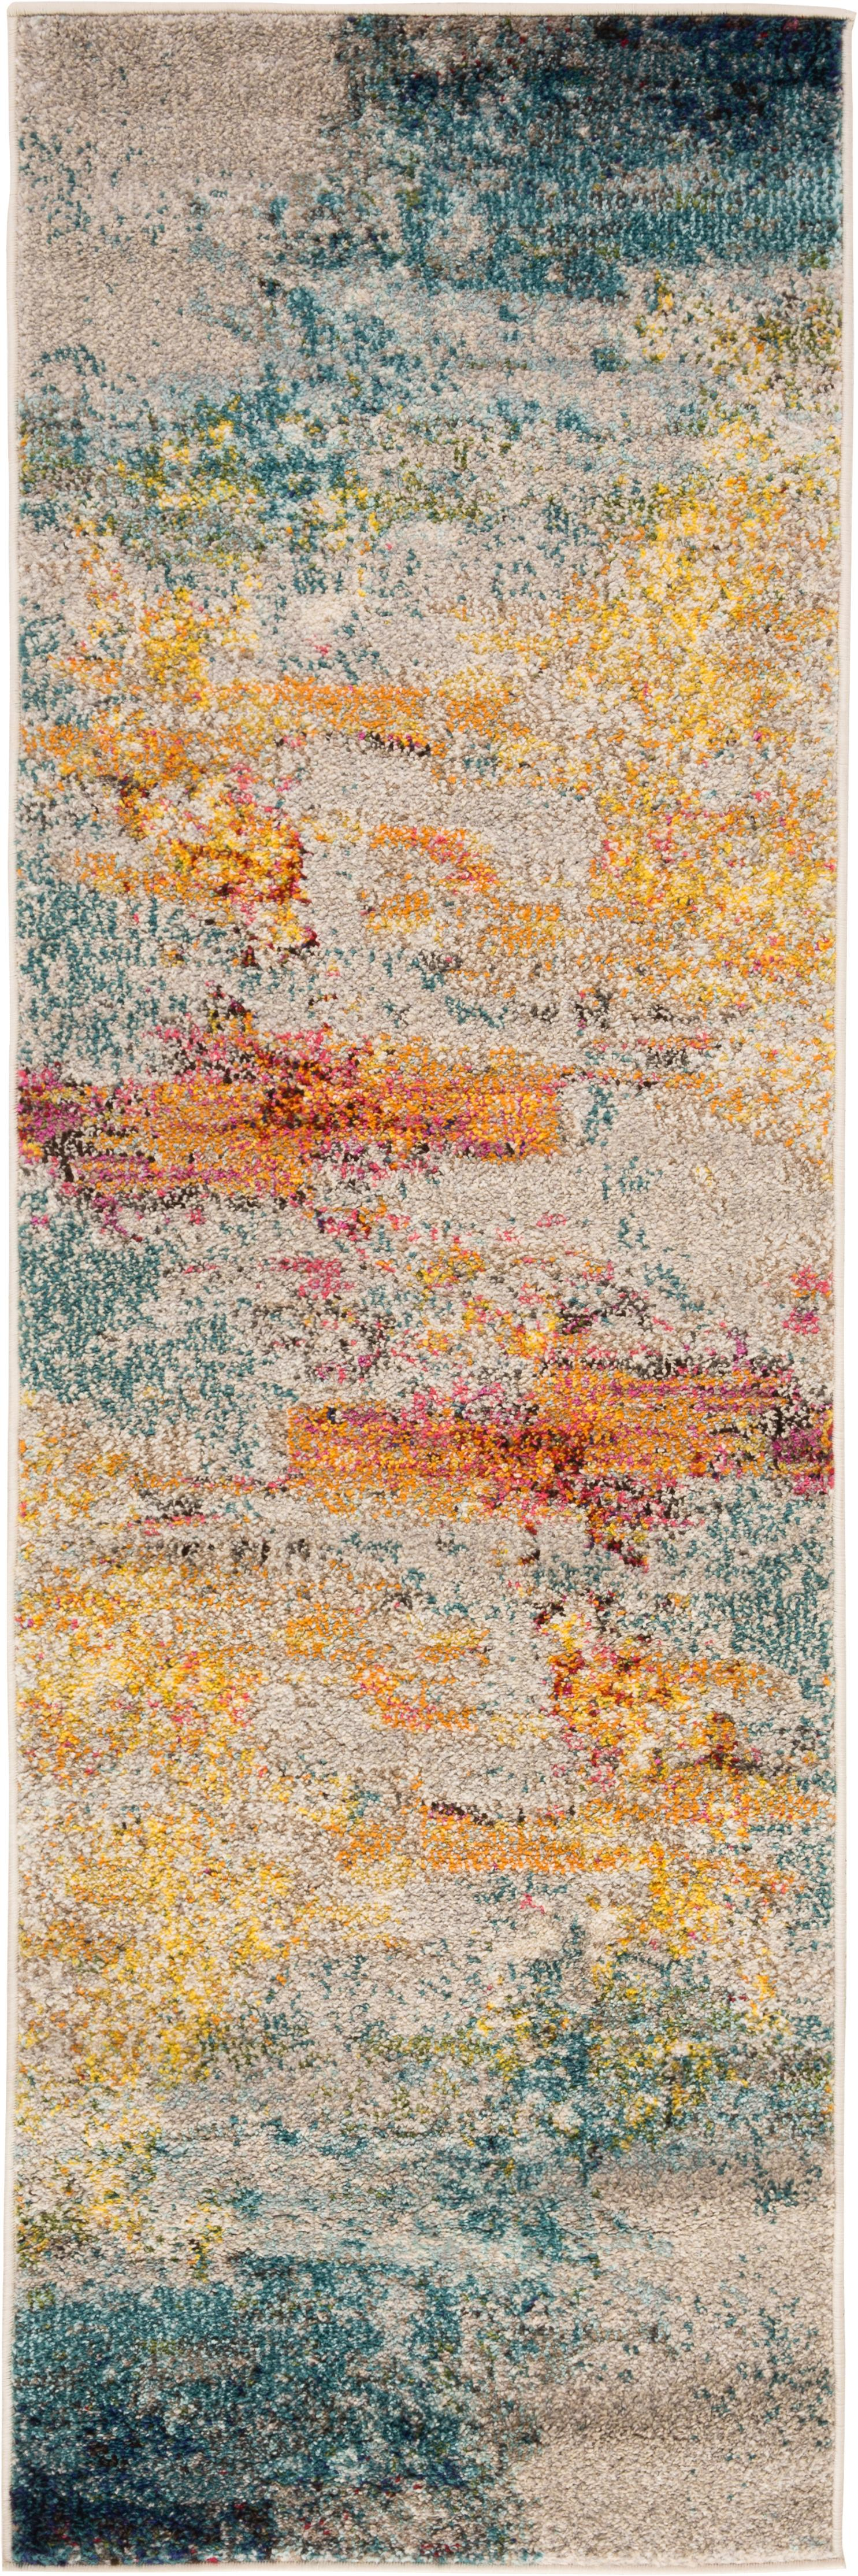 Design loper Celestial in kleur, Bovenzijde: 100% polypropyleen, Onderzijde: jute, Multicolour, 60 x 180 cm